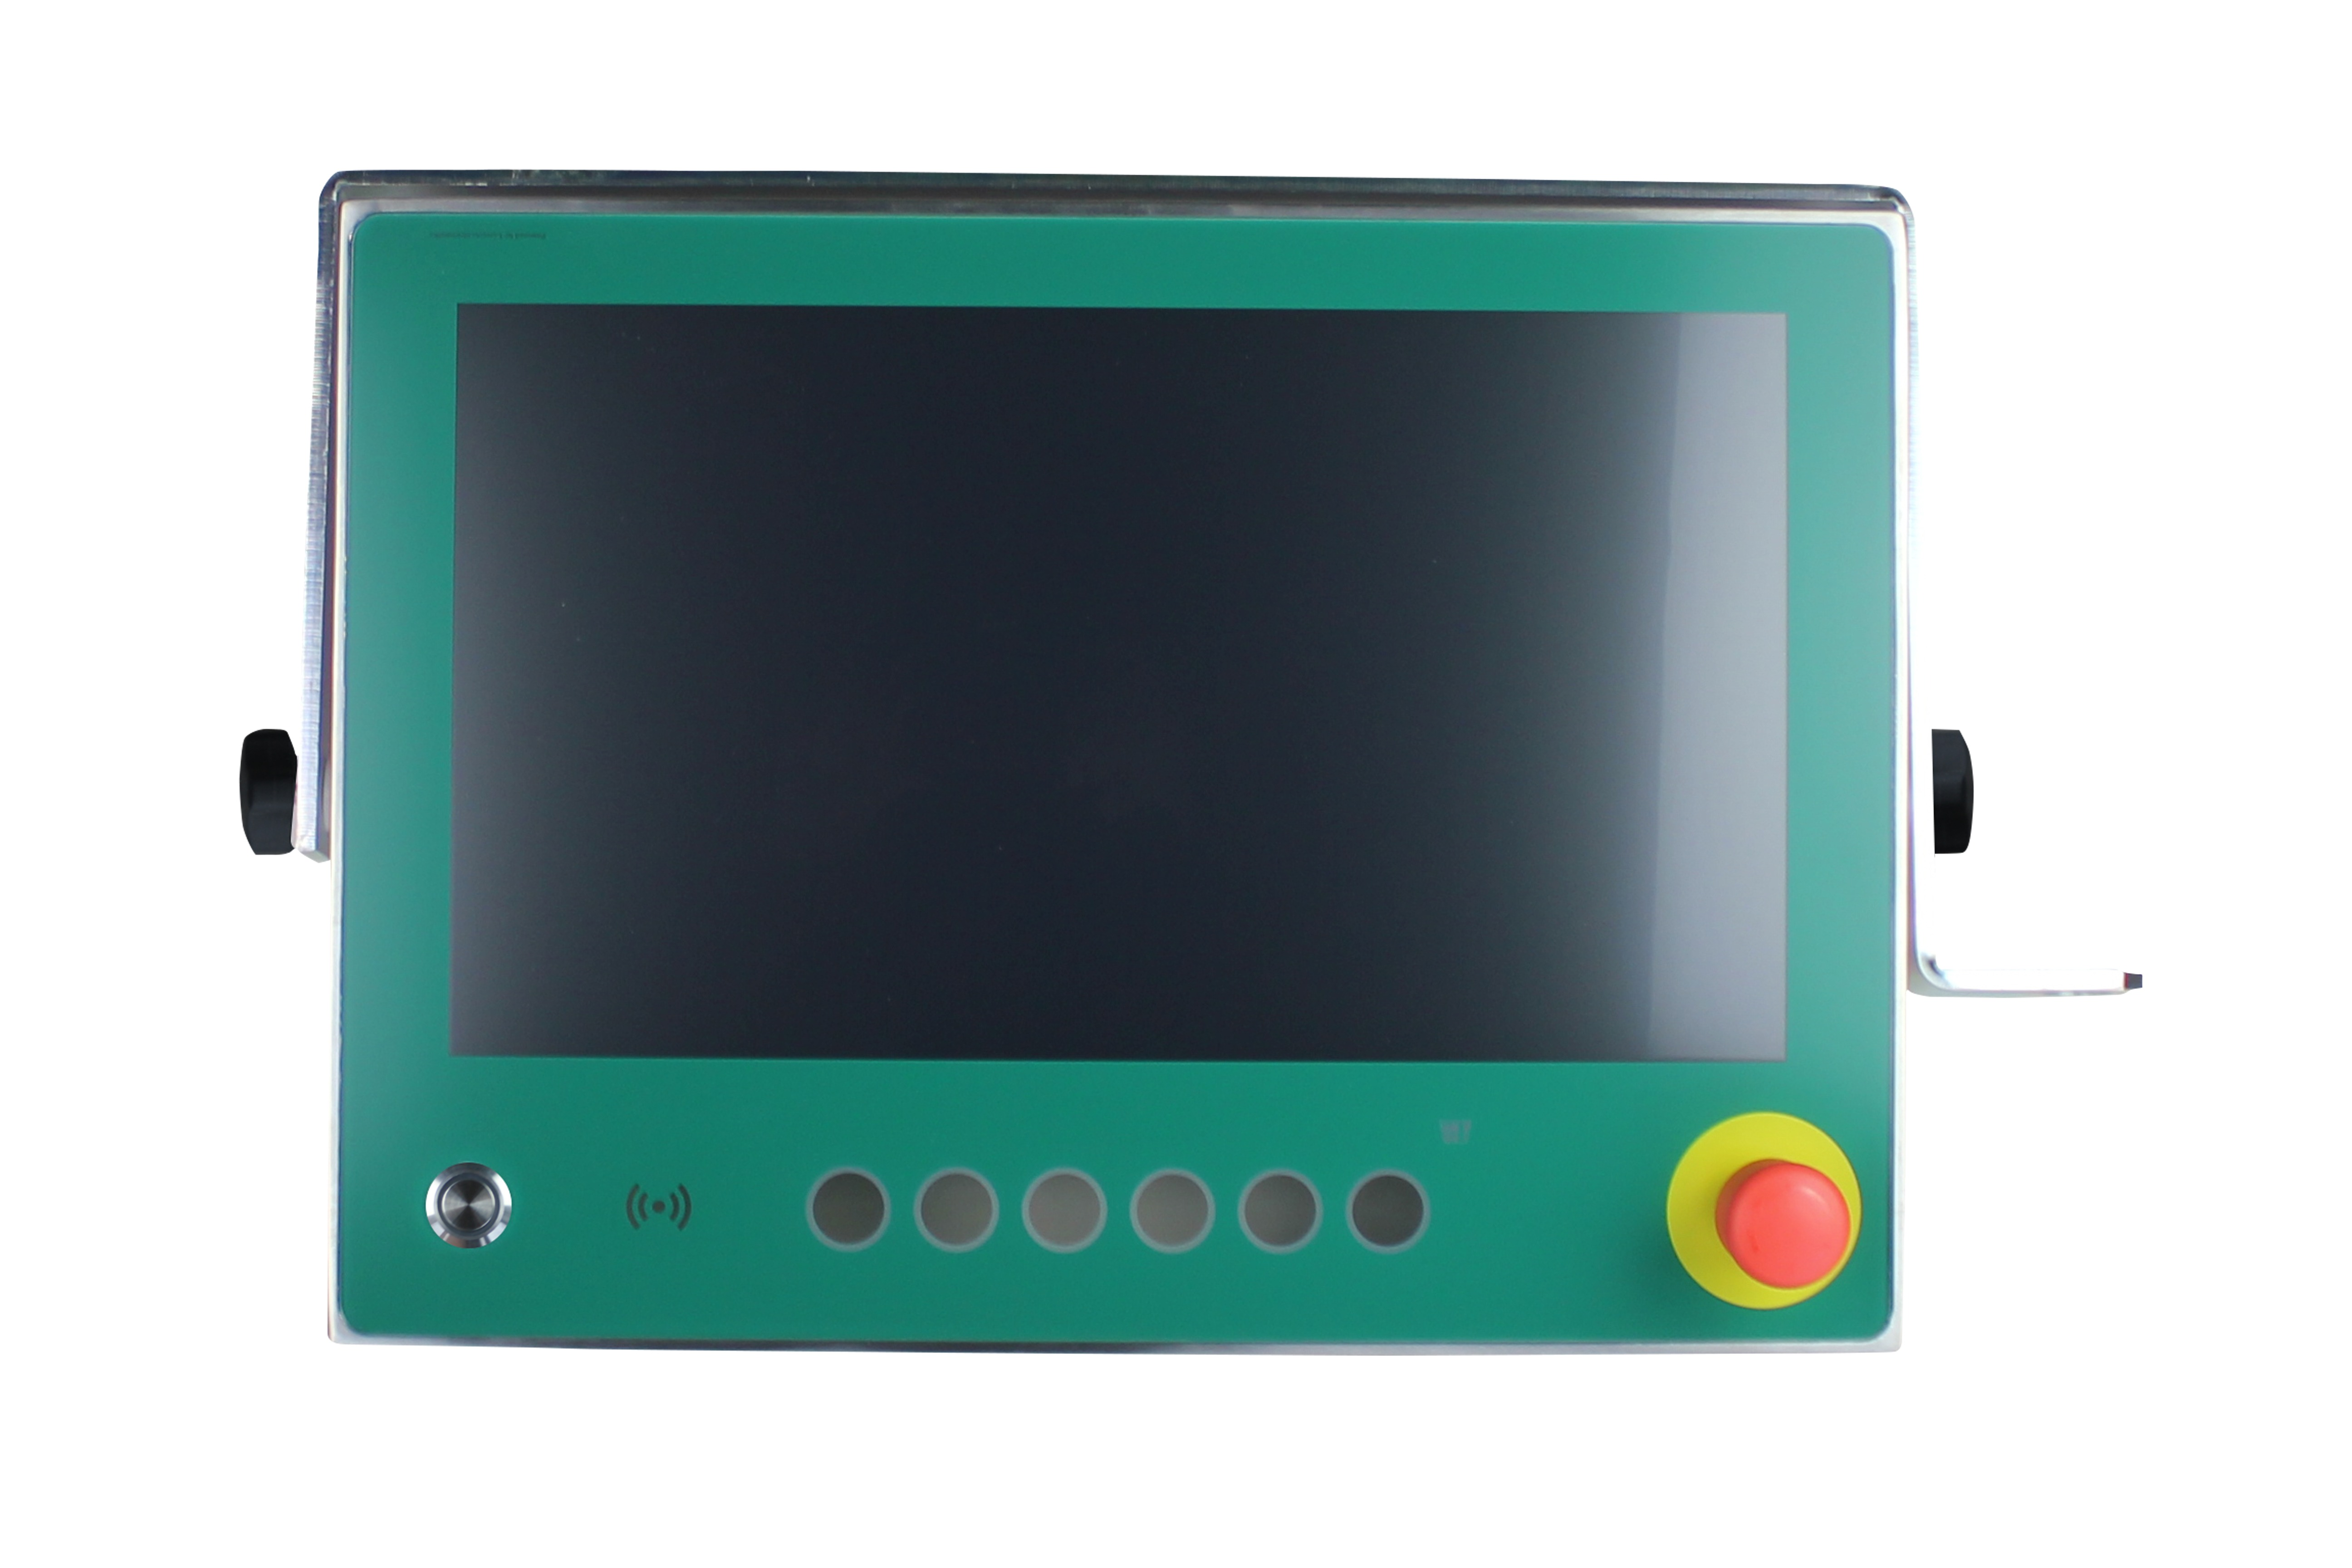 HIPC Larraioz Elektronika Controlador Industrial Higienizable